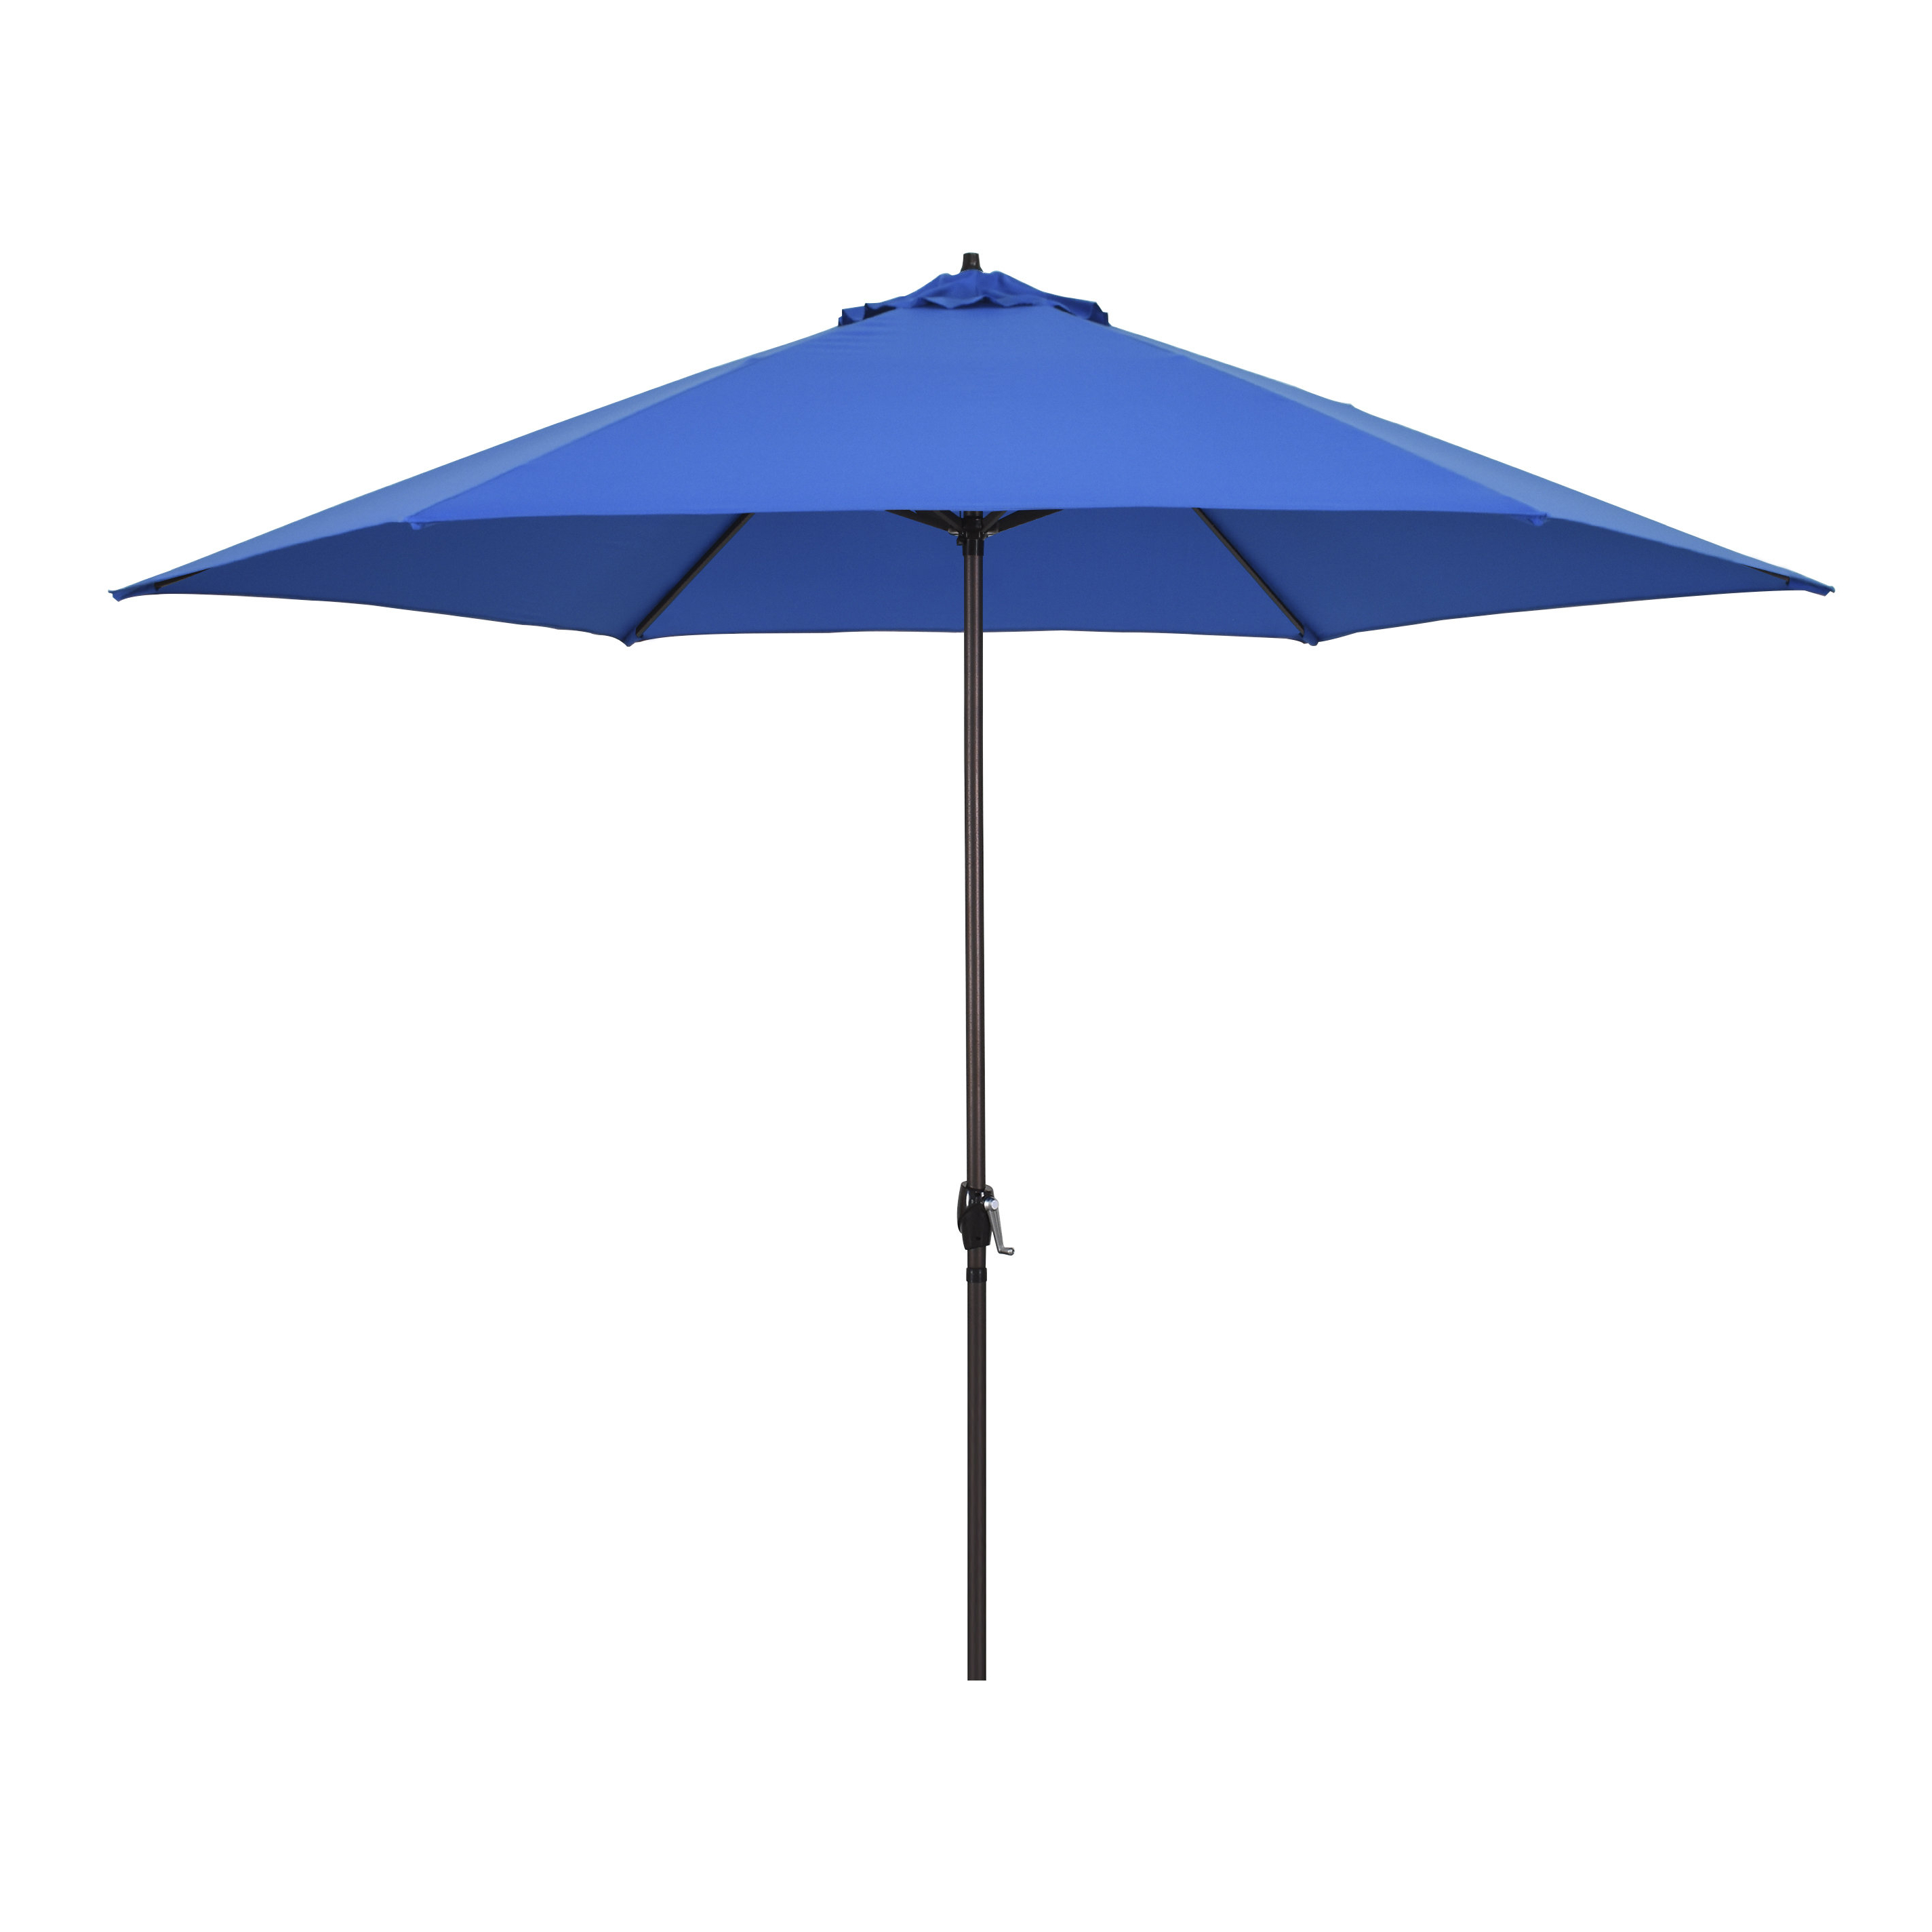 2020 Mcdougal 11' Market Umbrella With Regard To Launceston Rectangular Market Umbrellas (View 10 of 20)